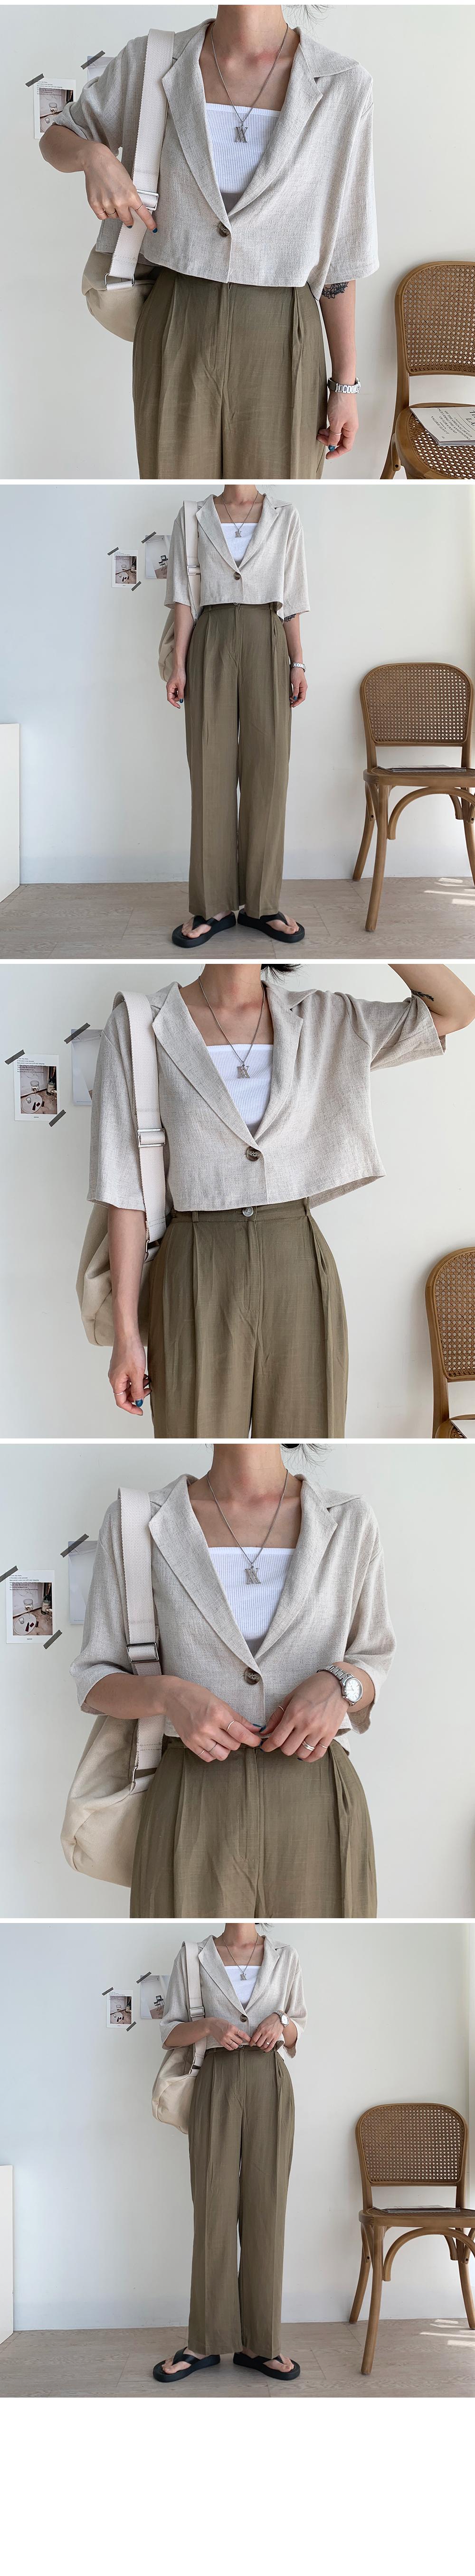 Linen cropped half jacket